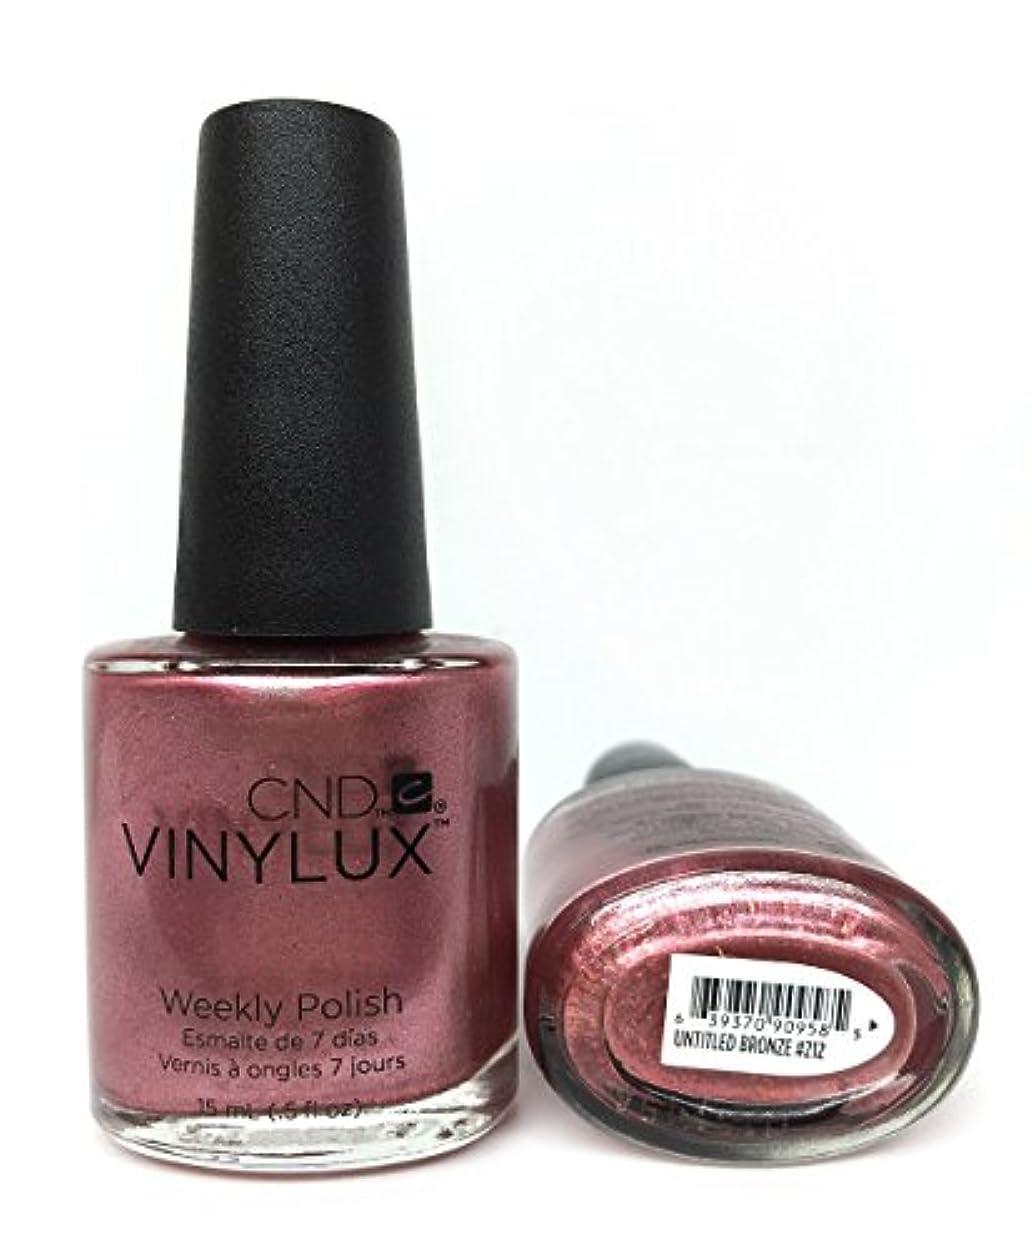 CND Vinylux Nail Polish - Untitled Bronze - 0.5oz / 15ml